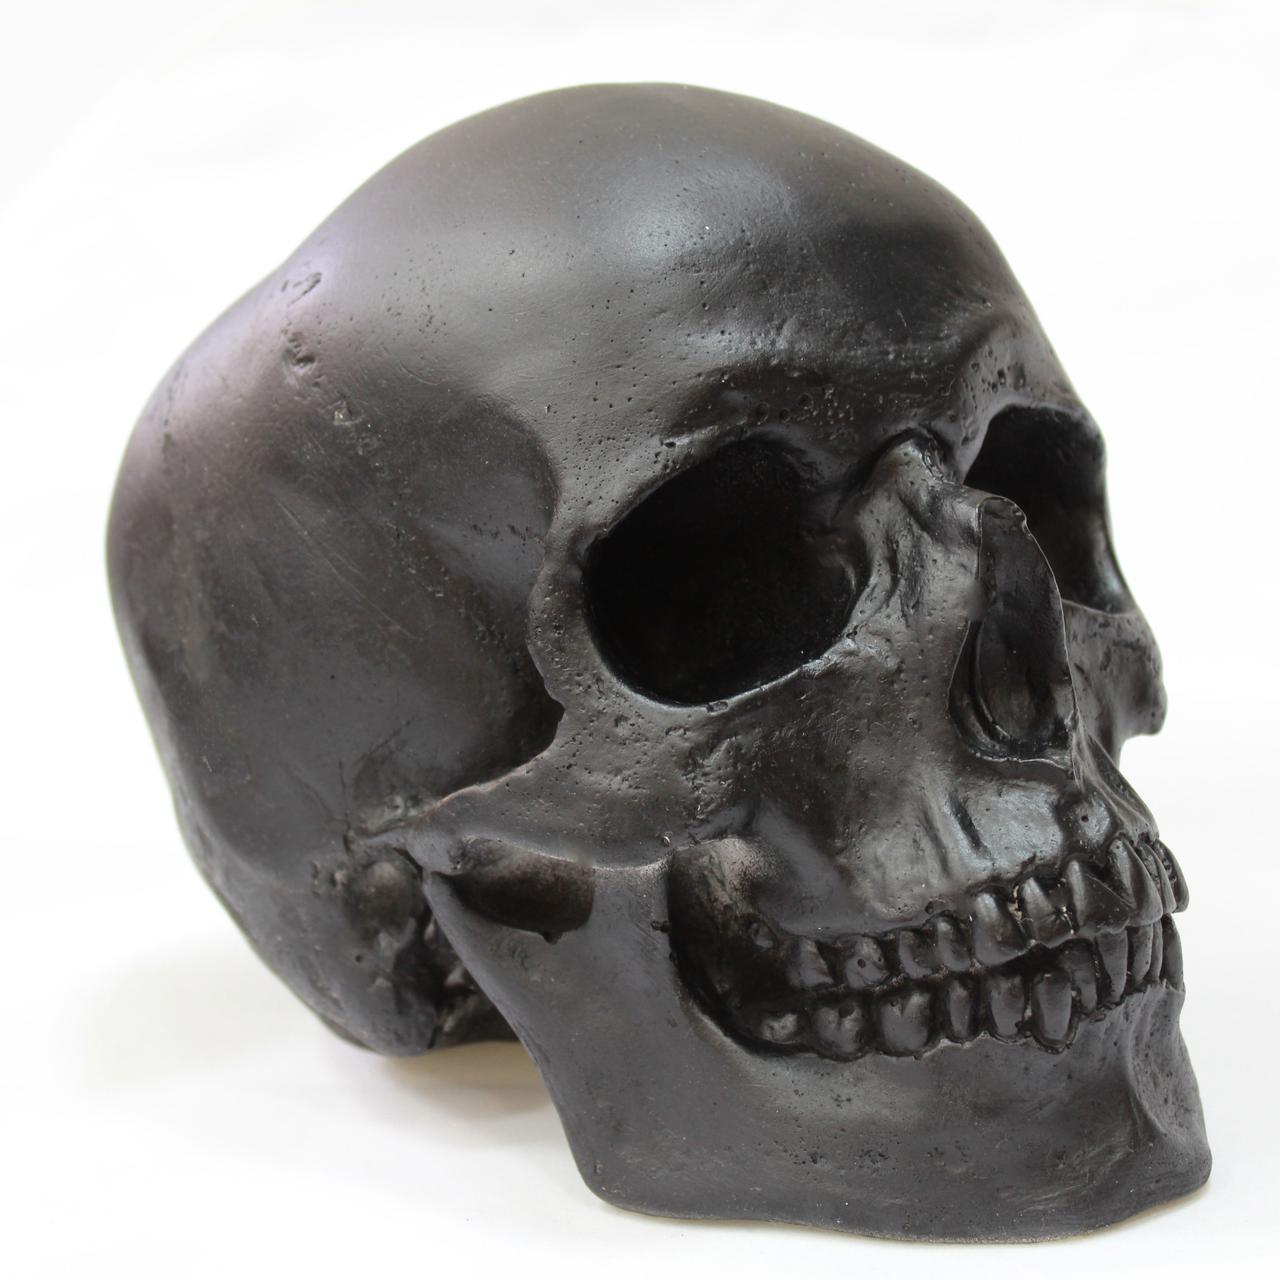 чёрный череп картинки